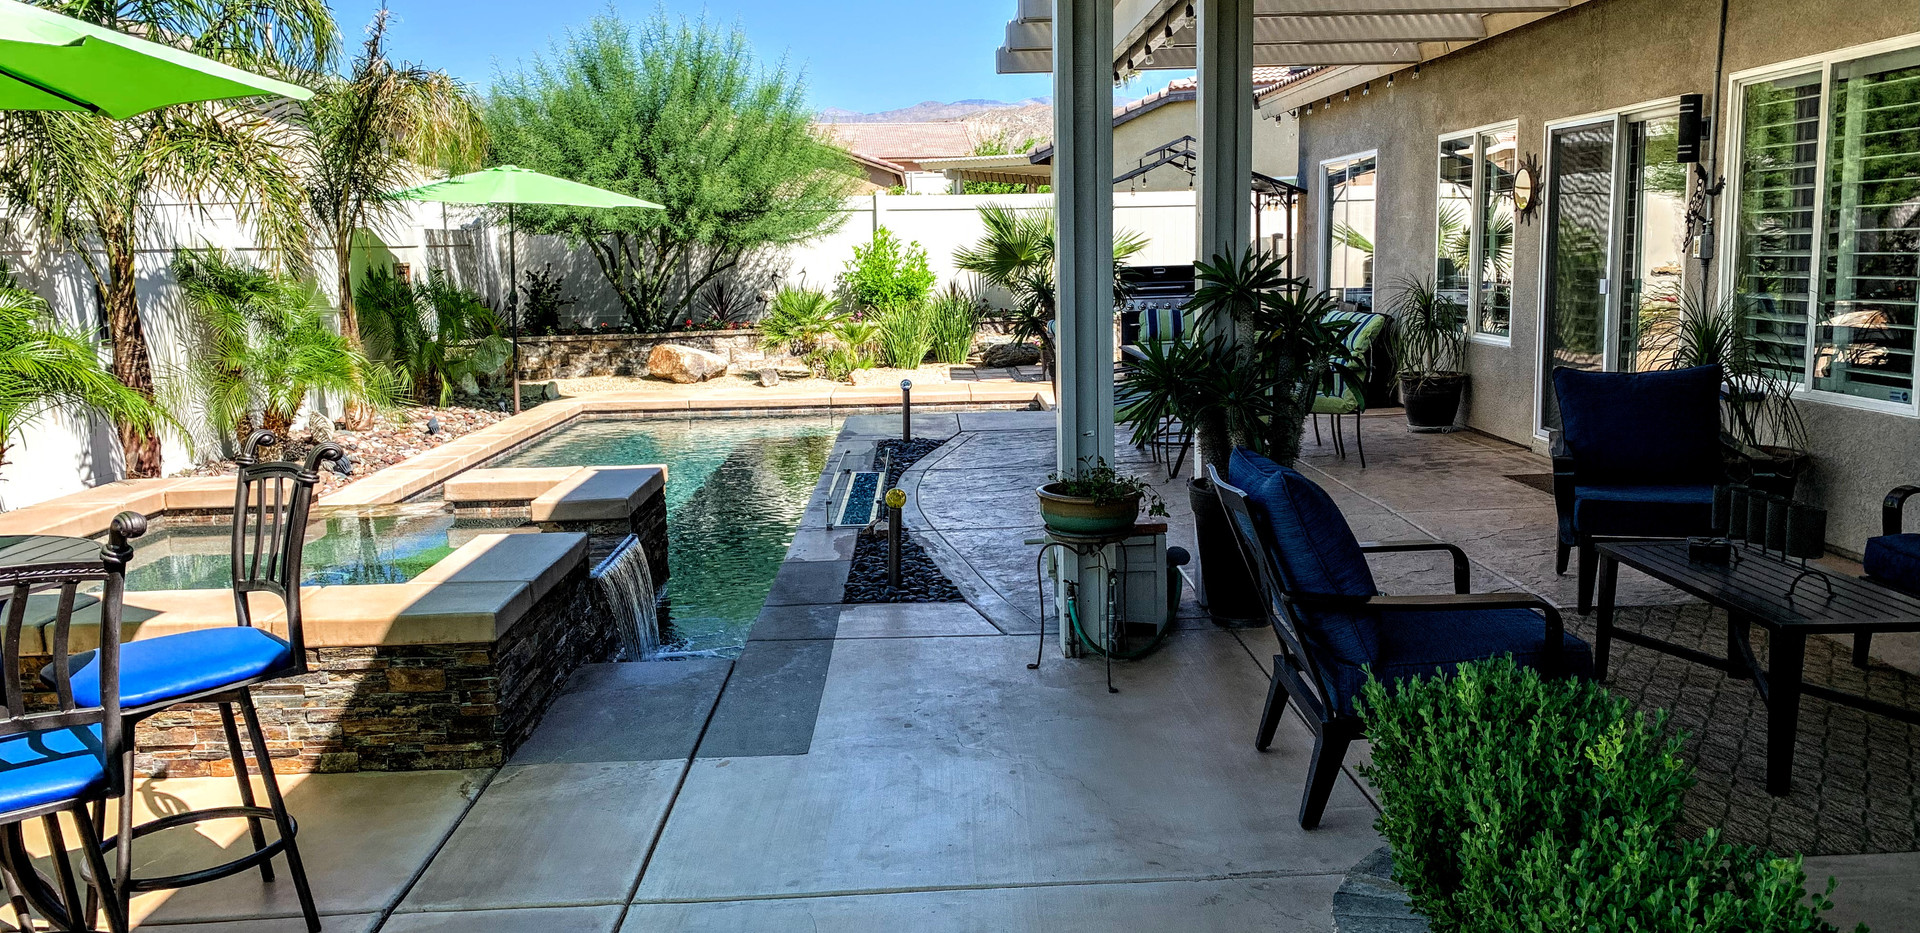 08-Yard-Pool-3.jpg